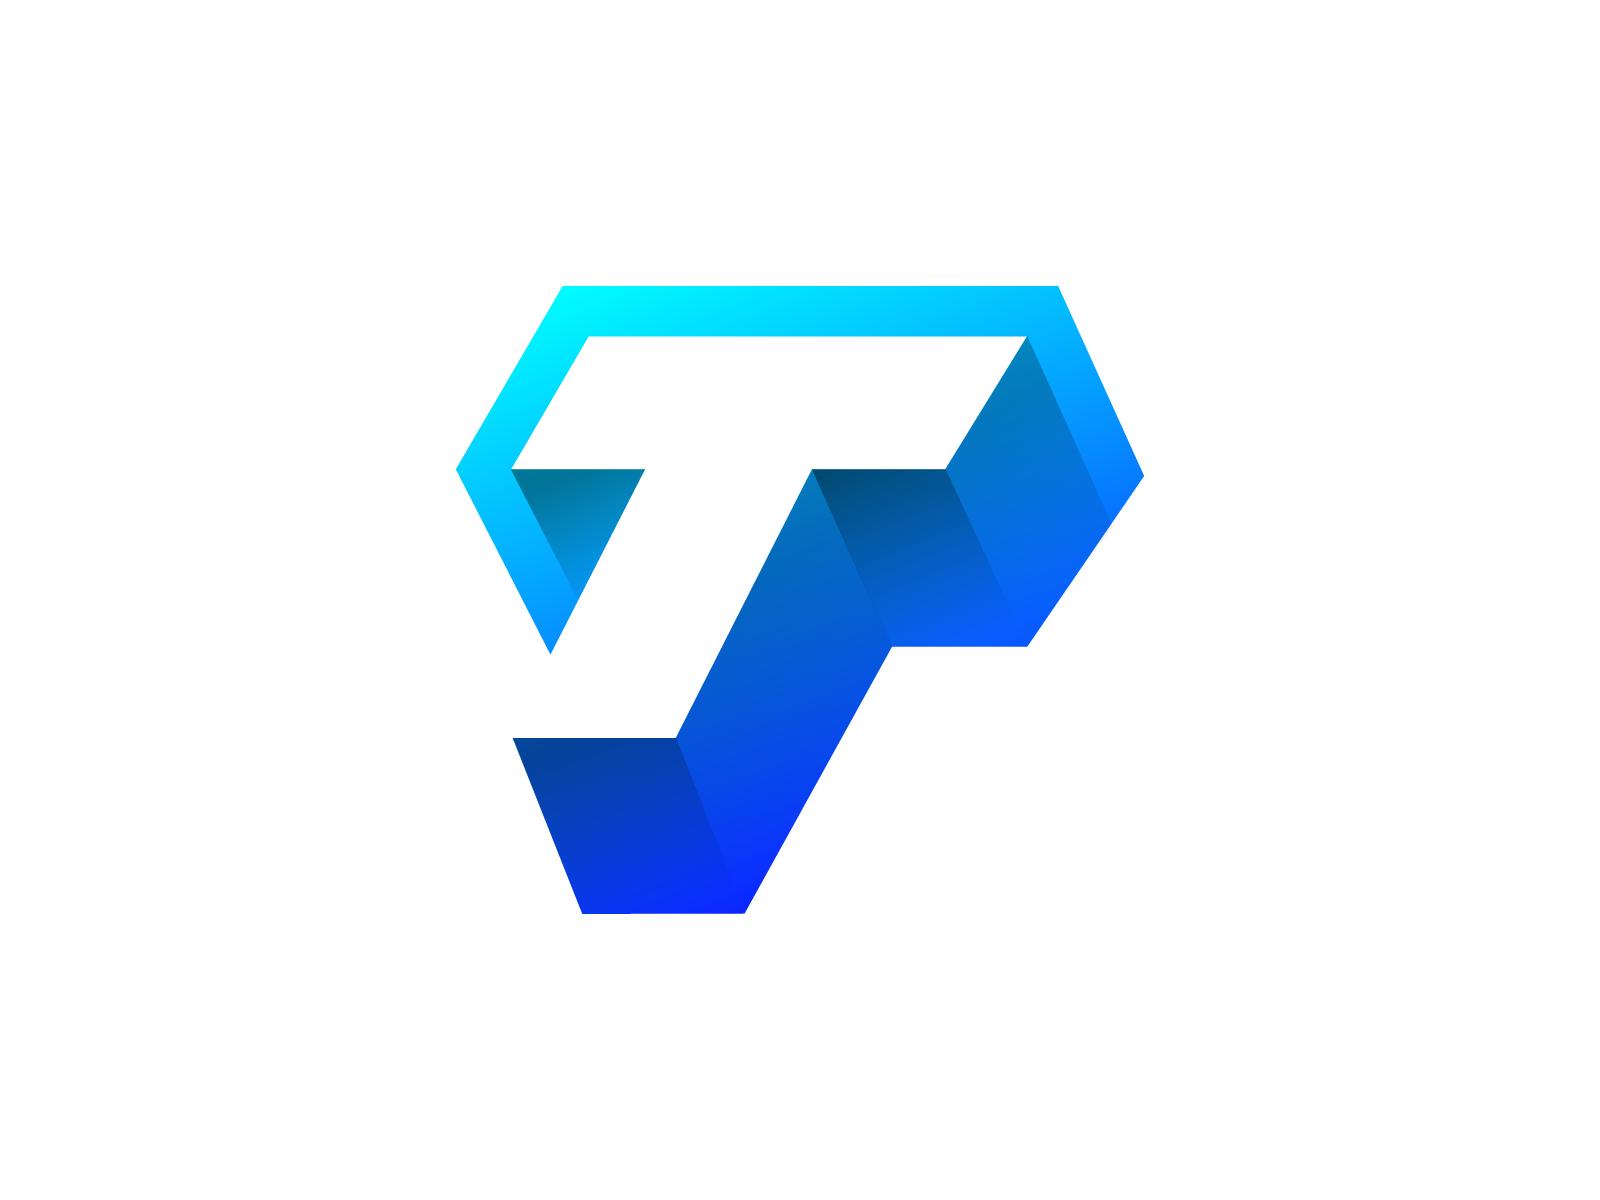 Letter T Exploration Concept 01 Unused For Sale Lettering Letter T Logo Mark